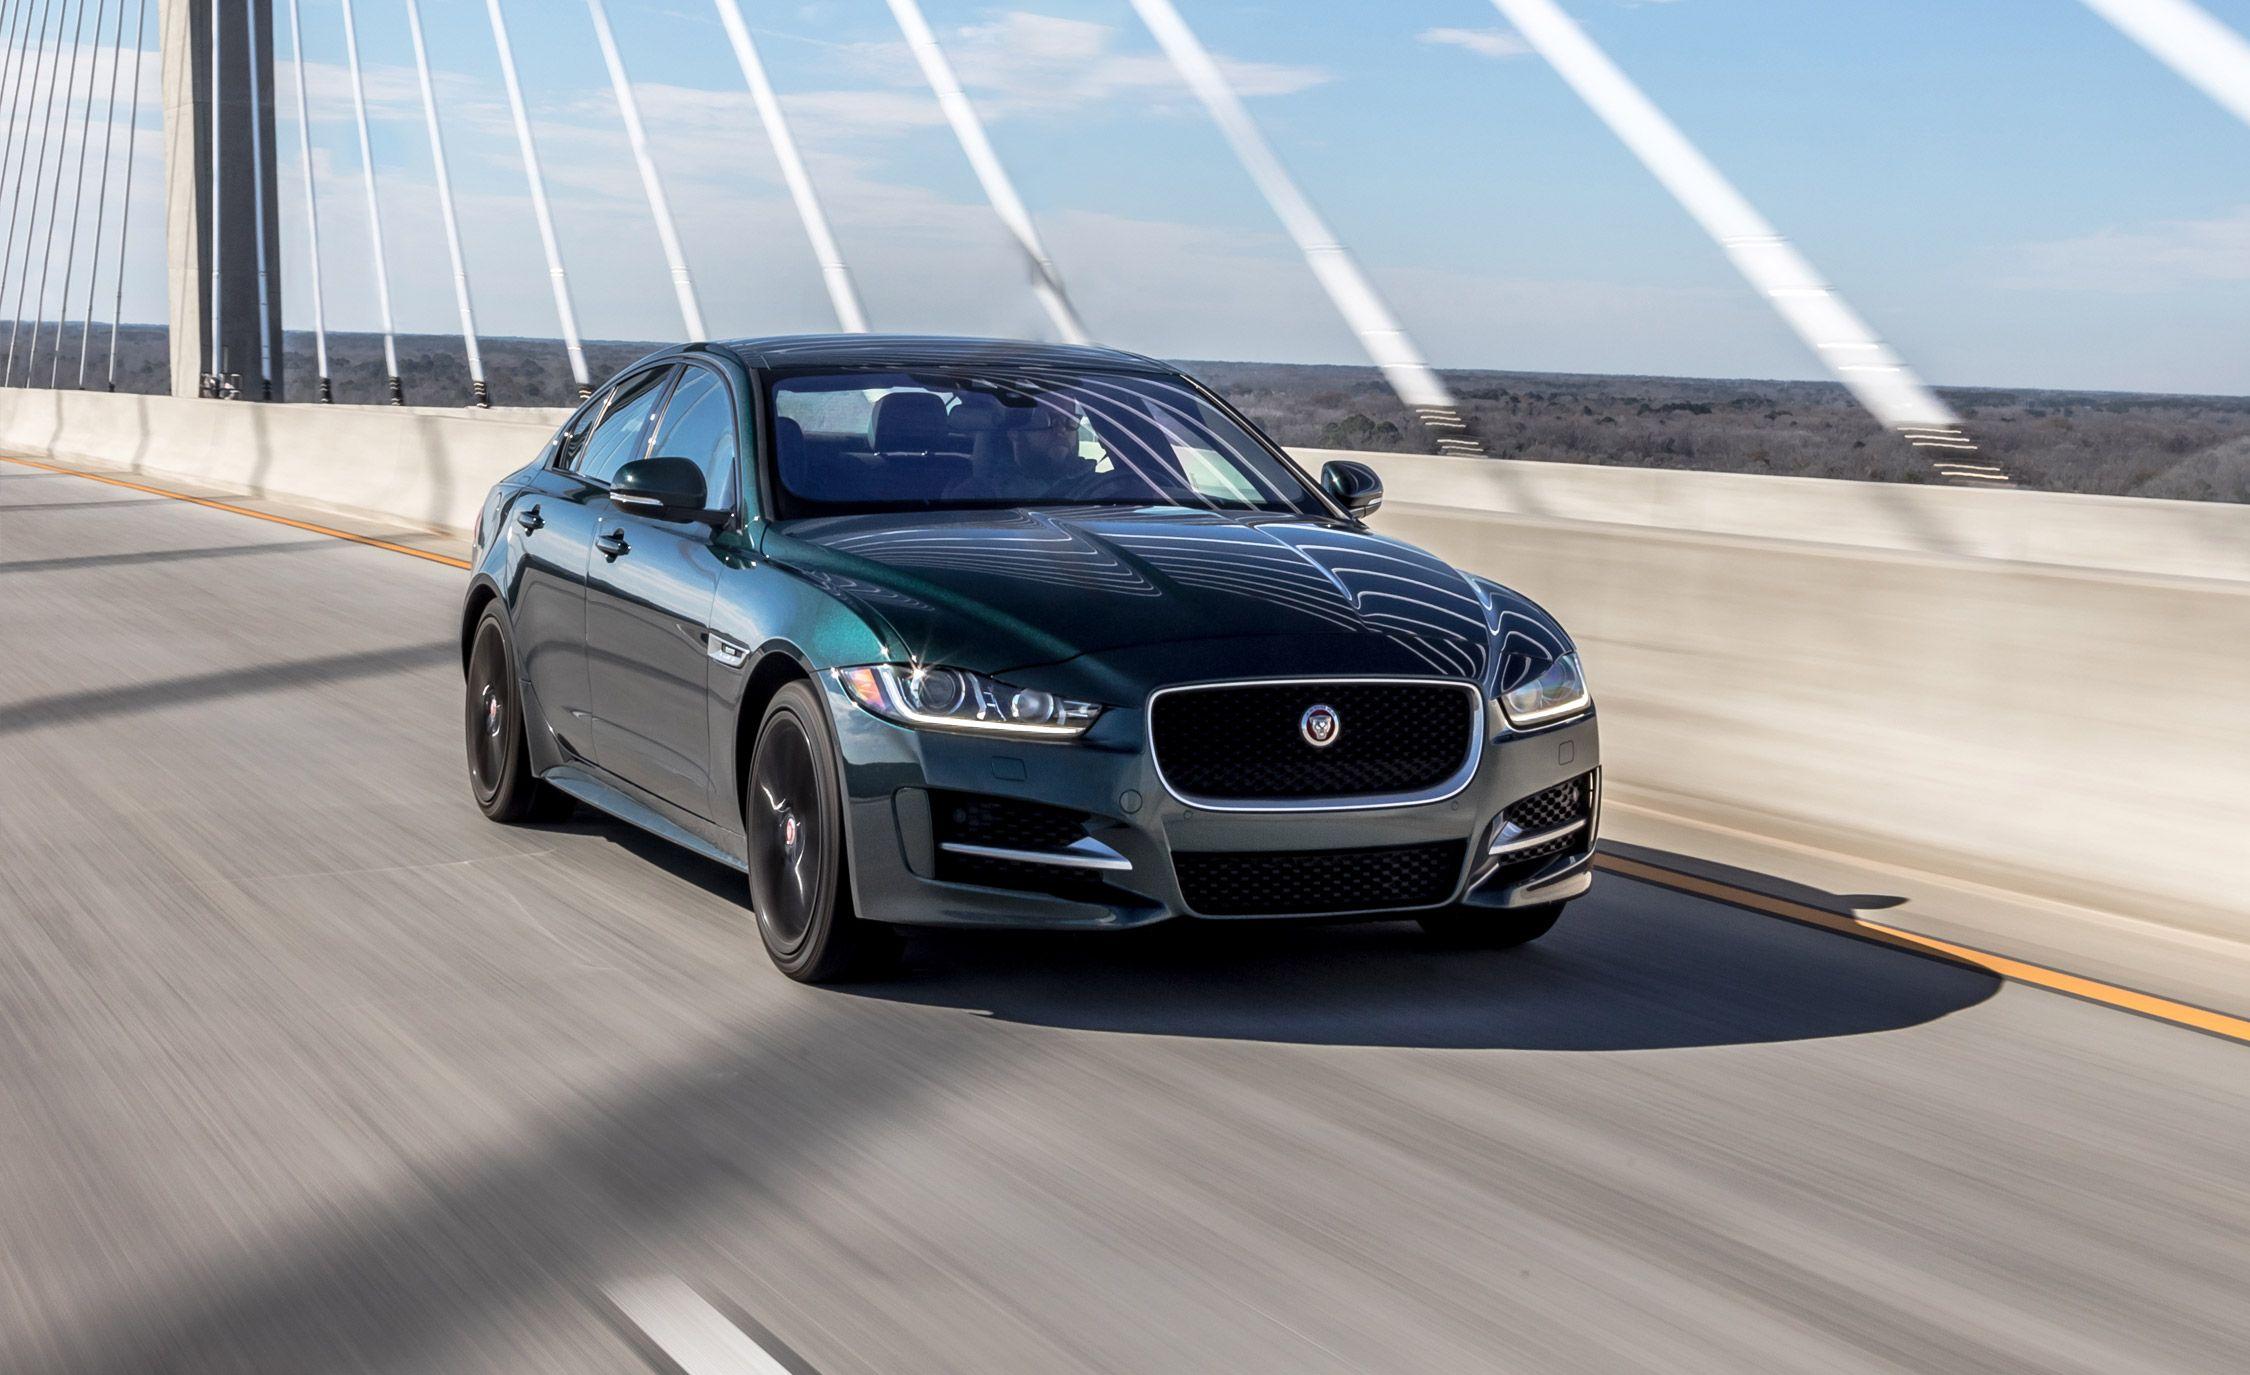 Jaguar XE Reviews Jaguar XE Price s and Specs